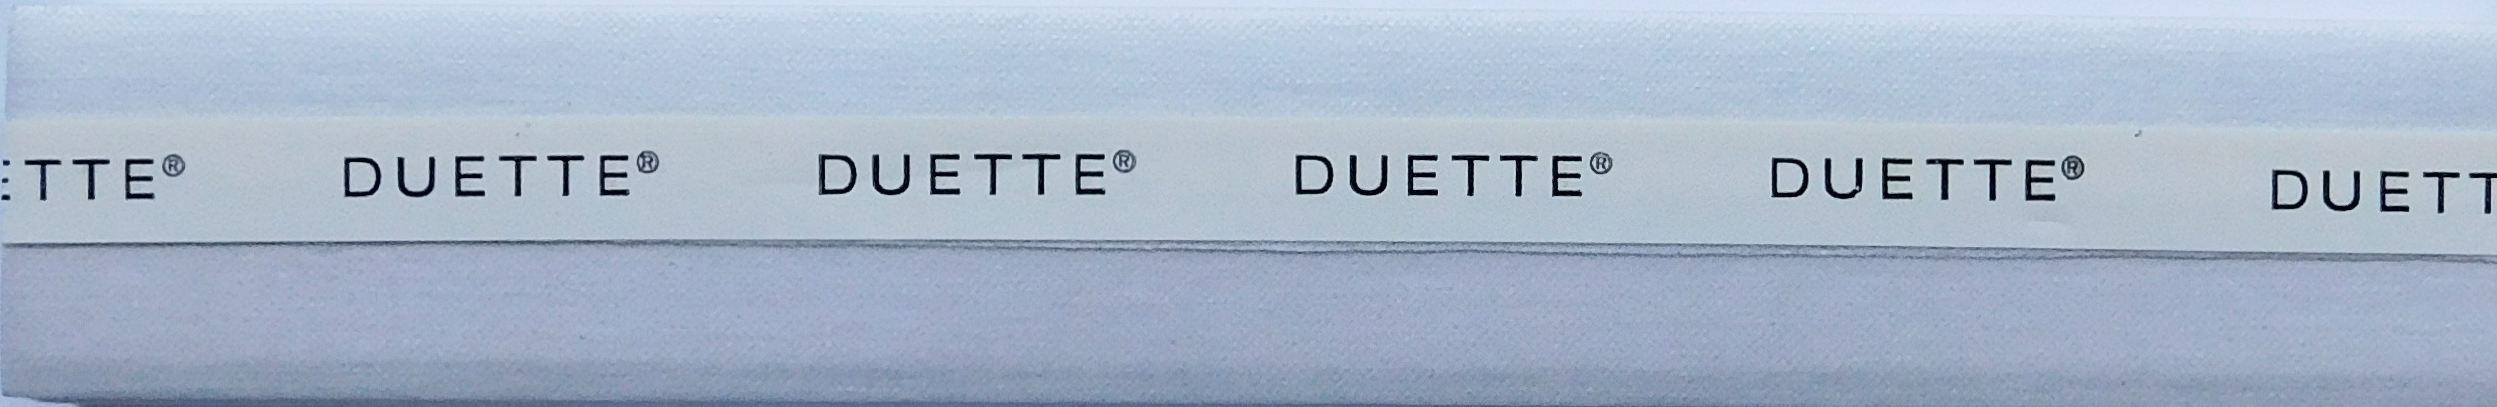 Elan Greyscale Duotone Duette Blind Fabric